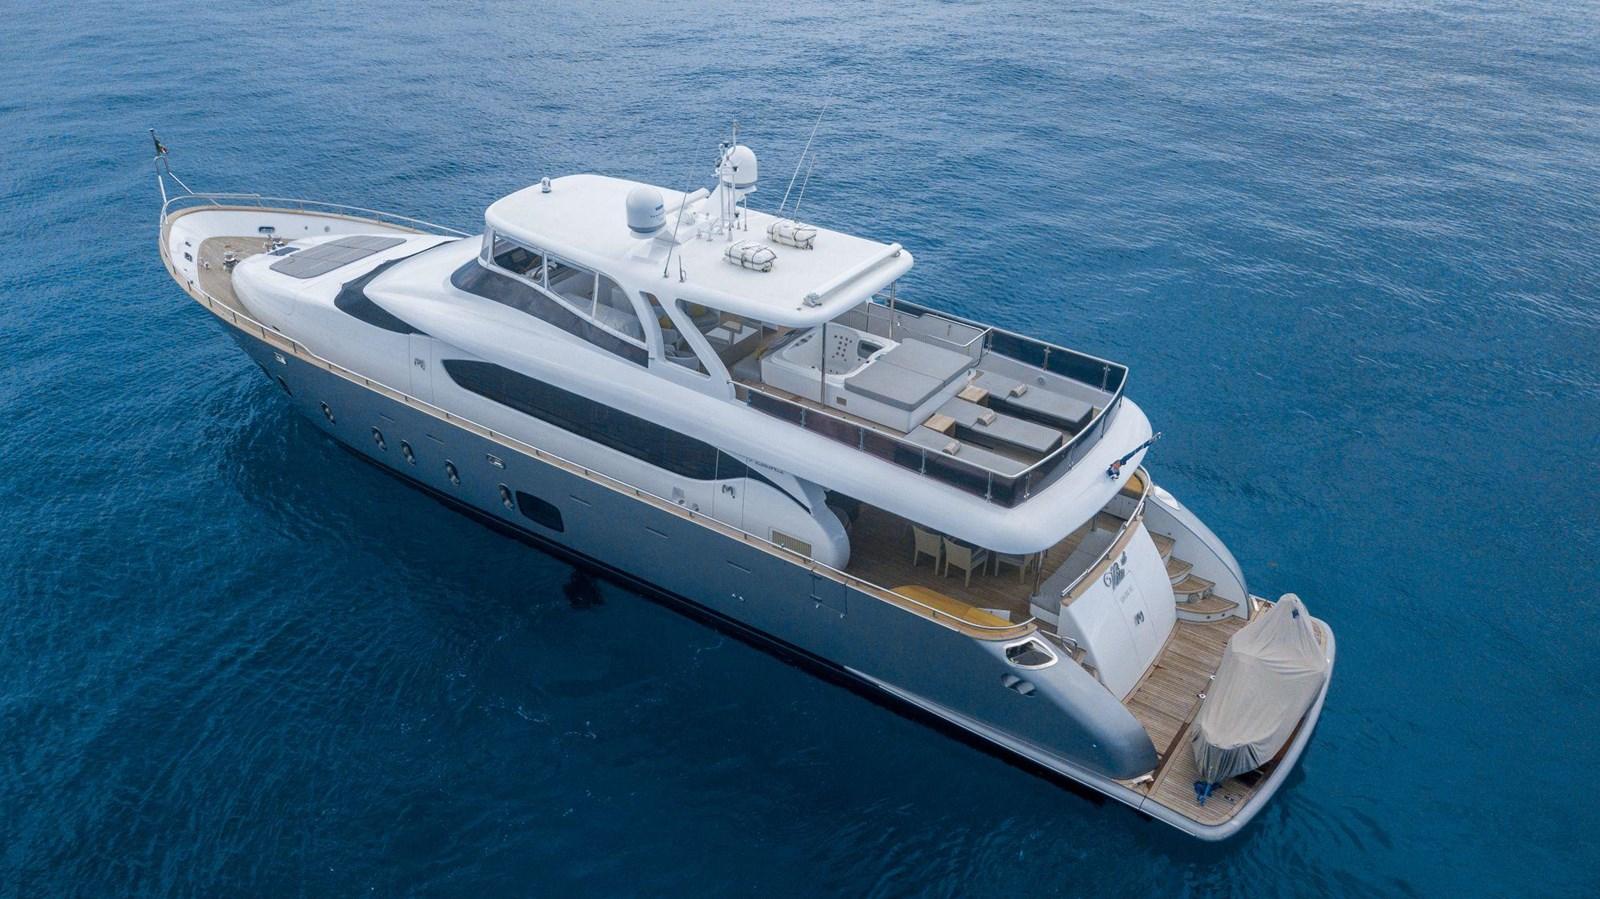 Vita XL yacht for sale